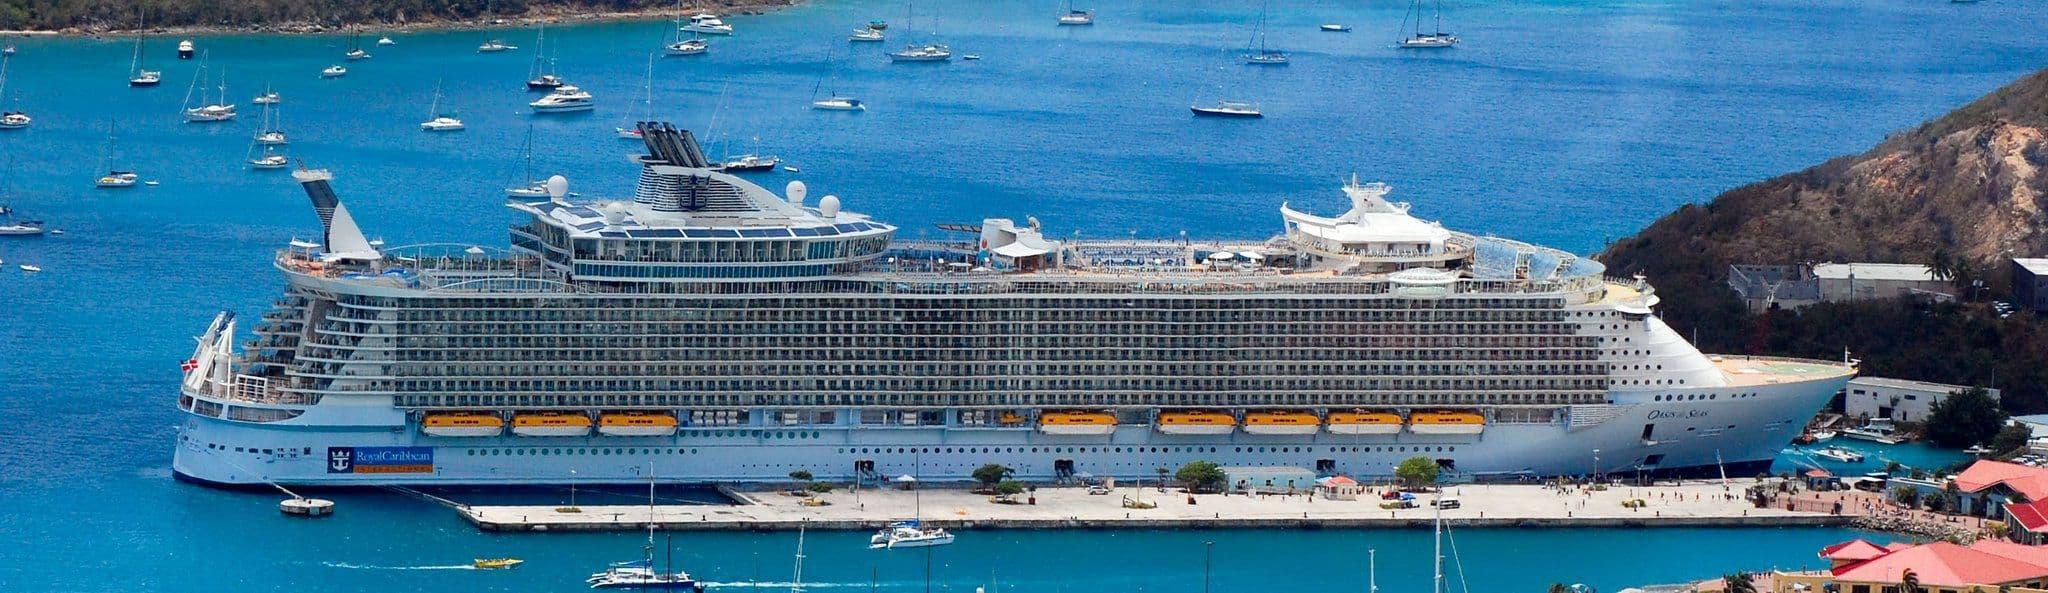 Картинки по запросу Лайнер Oasis of the Seas